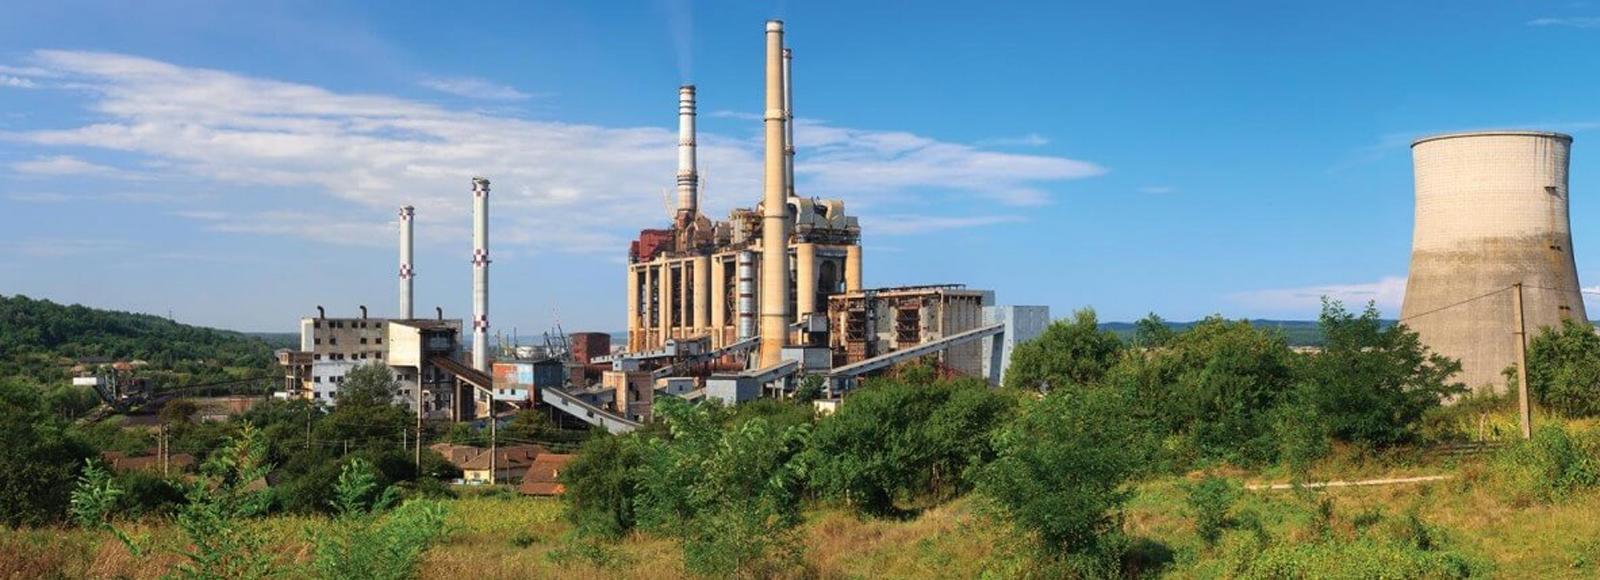 FGD Power Plant - Header